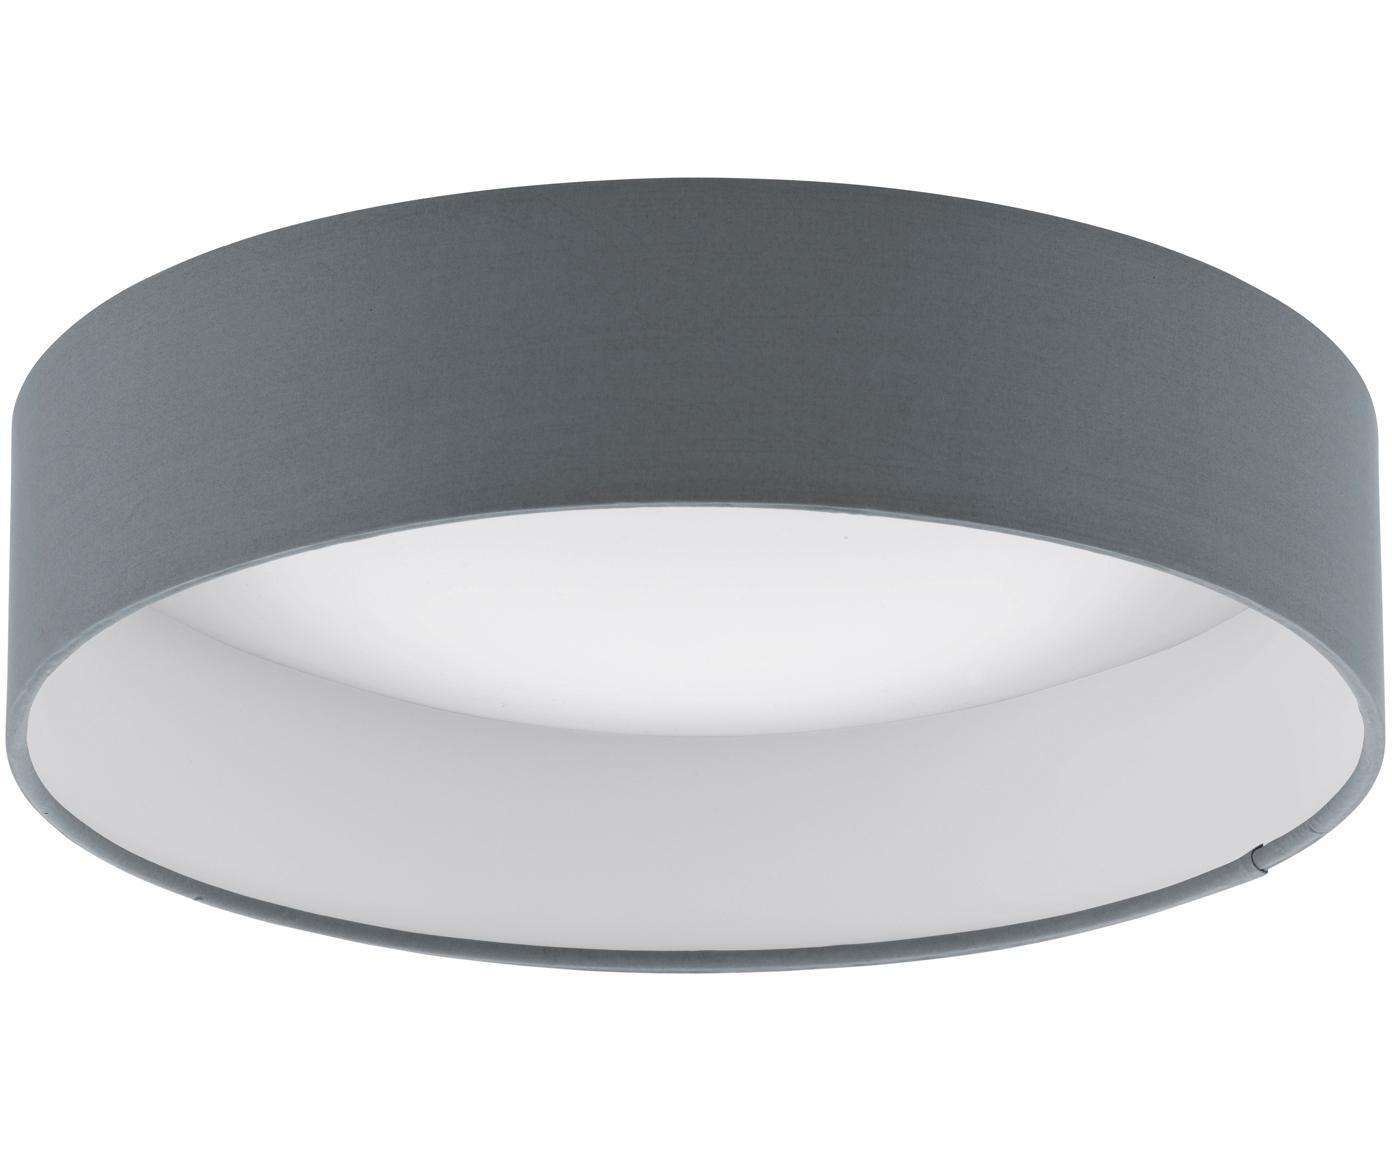 LED plafondlamp Paloma, Antraciet, Ø 50 x H 11 cm